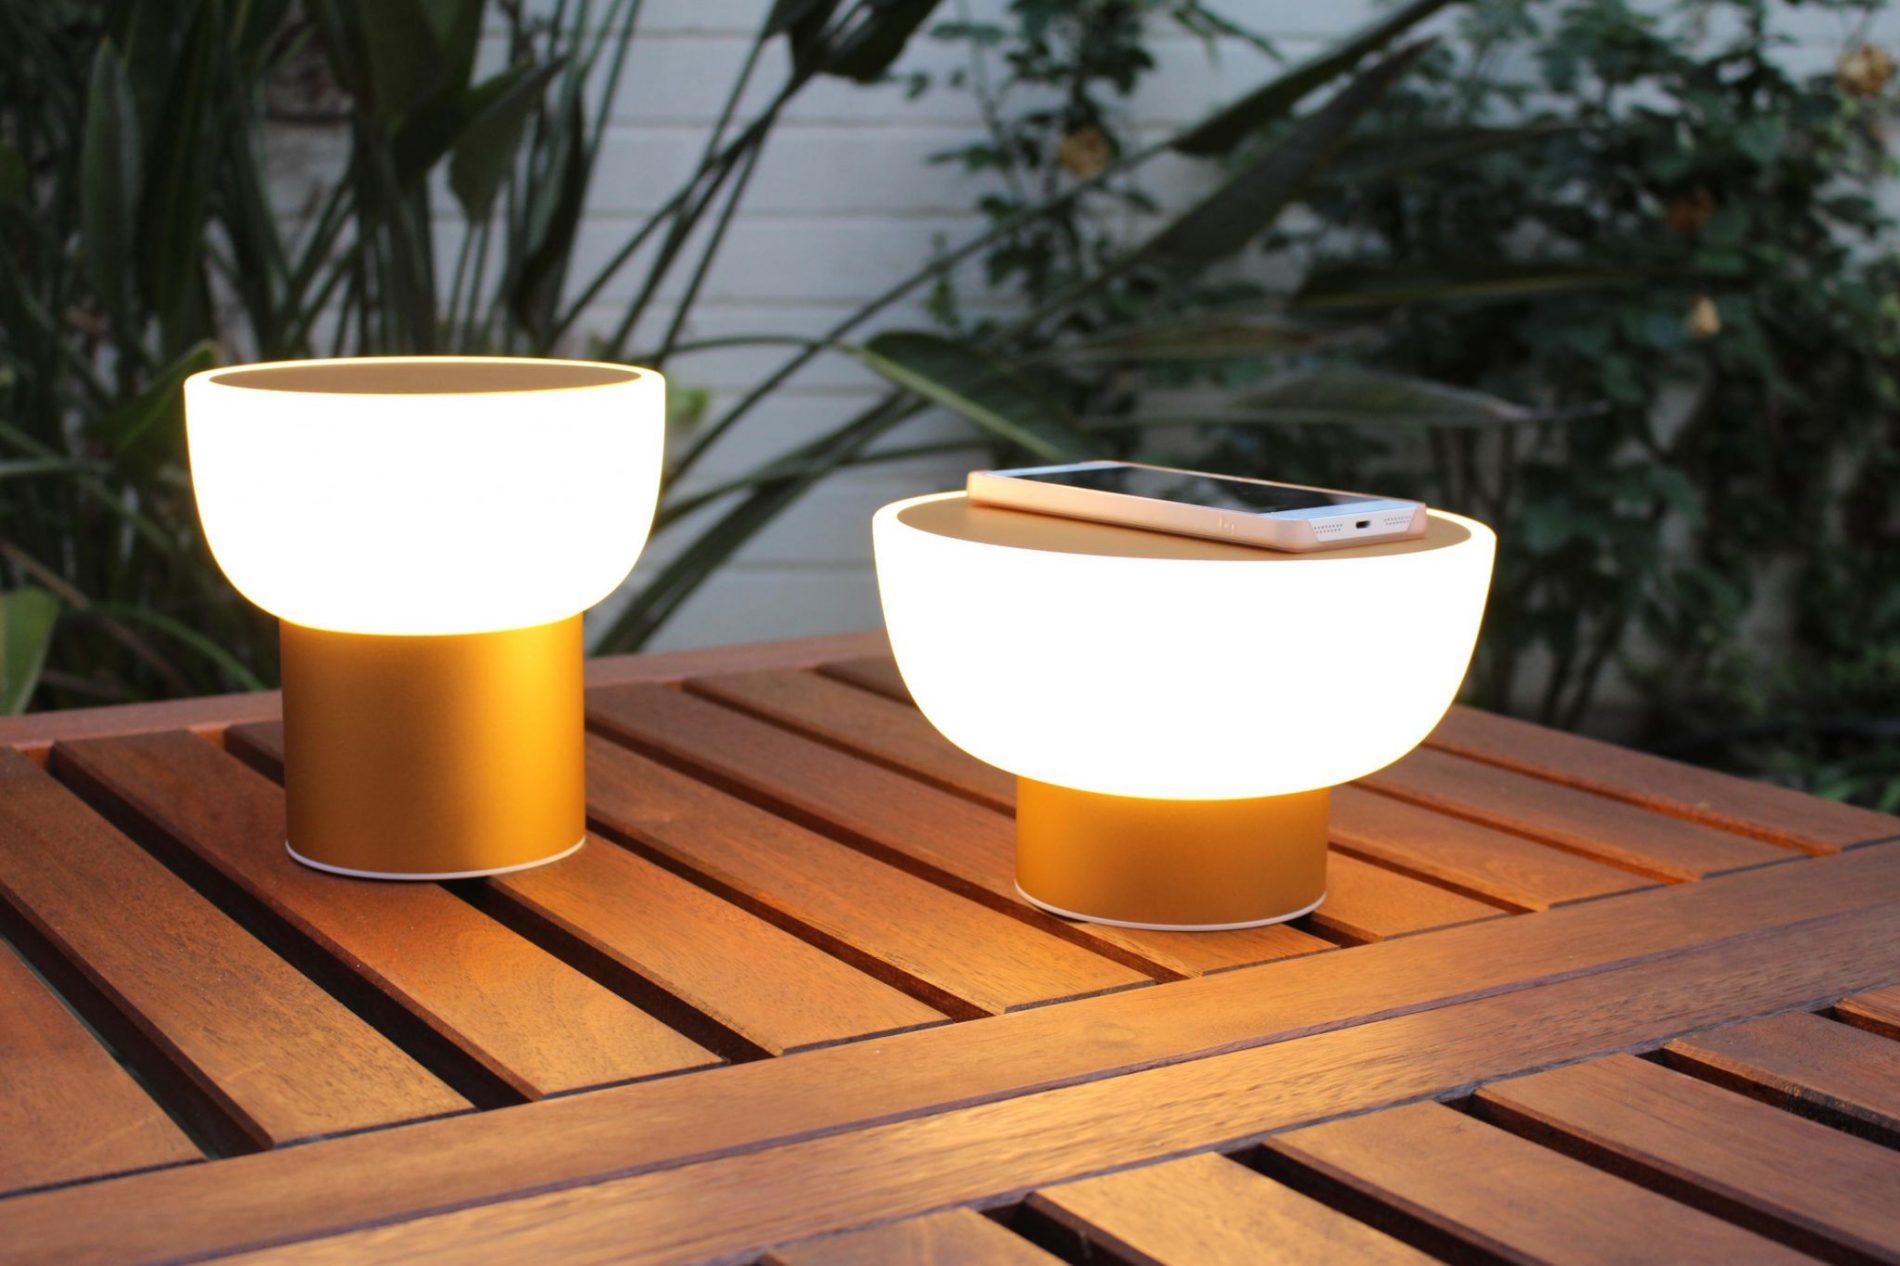 lampada senza fili ricaricabile di design